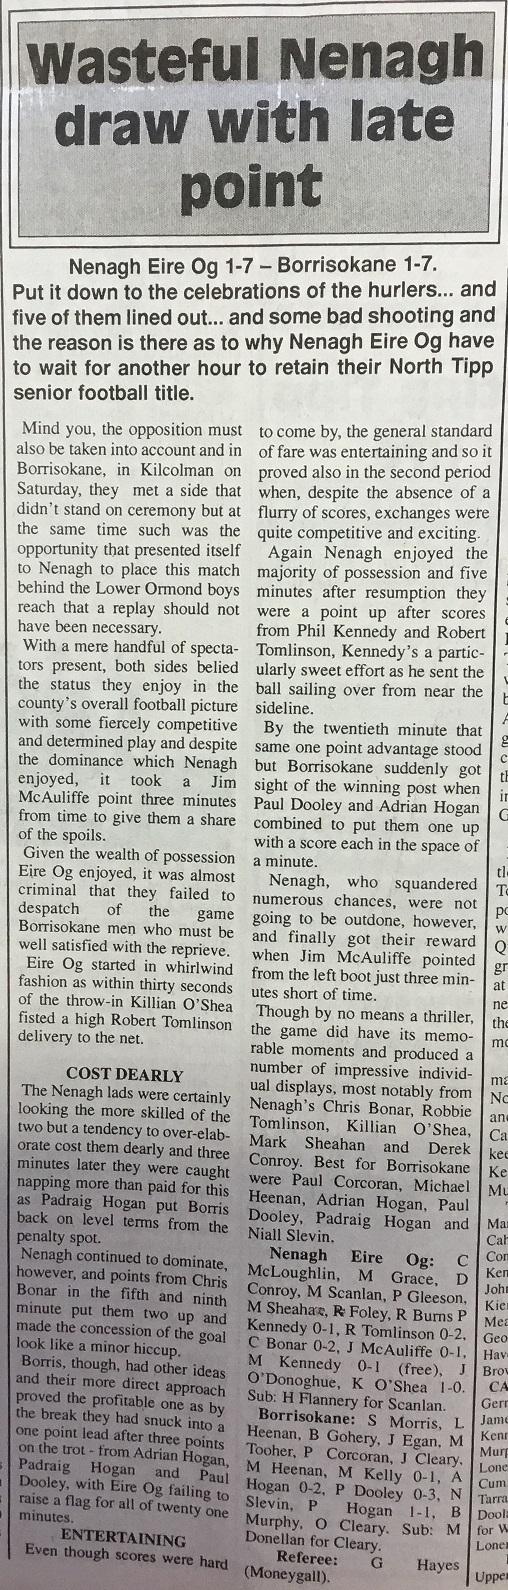 1995 North football final